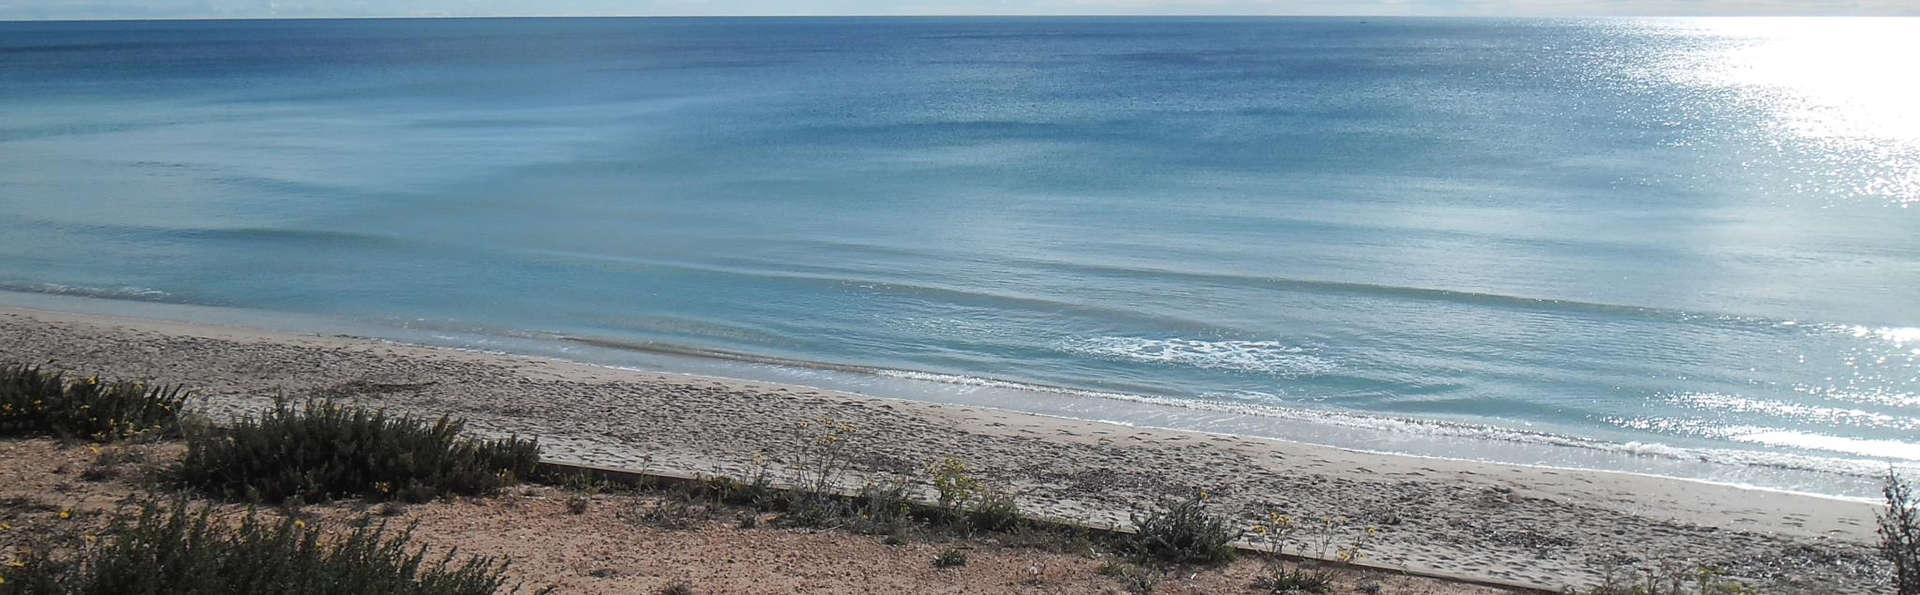 Palmera Beach - edit_surroundings.jpg